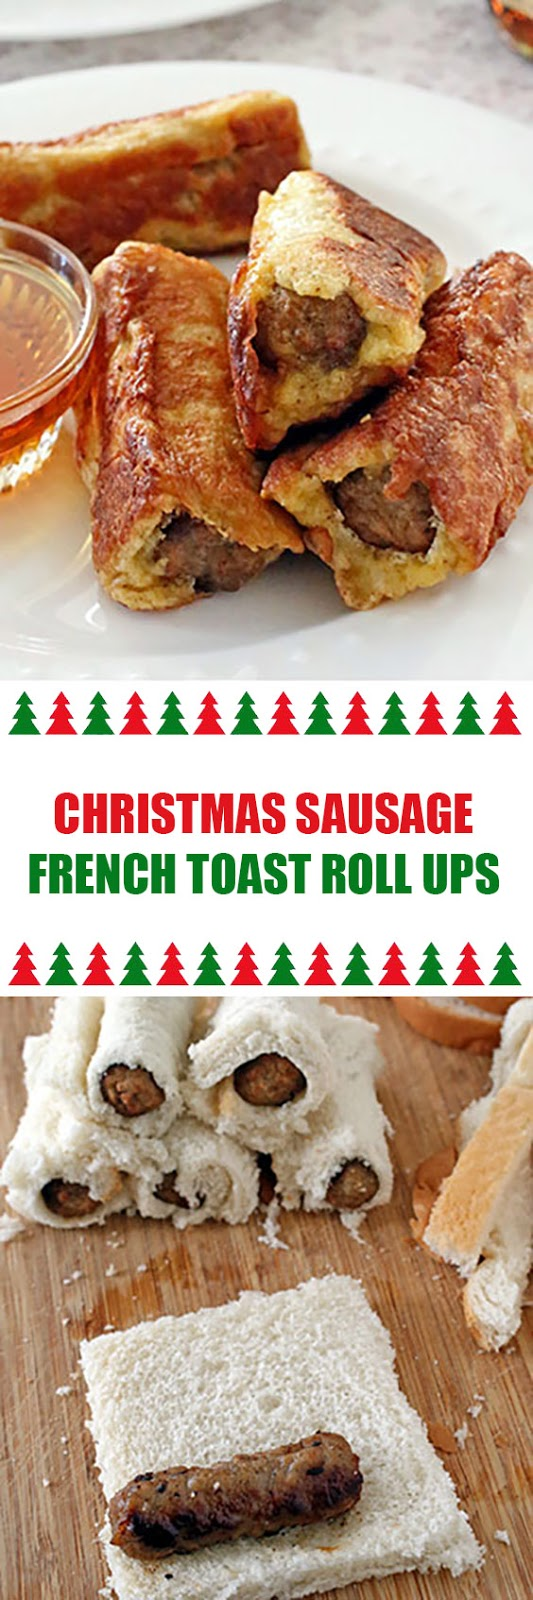 Christmas Sausage French Toast Roll Ups